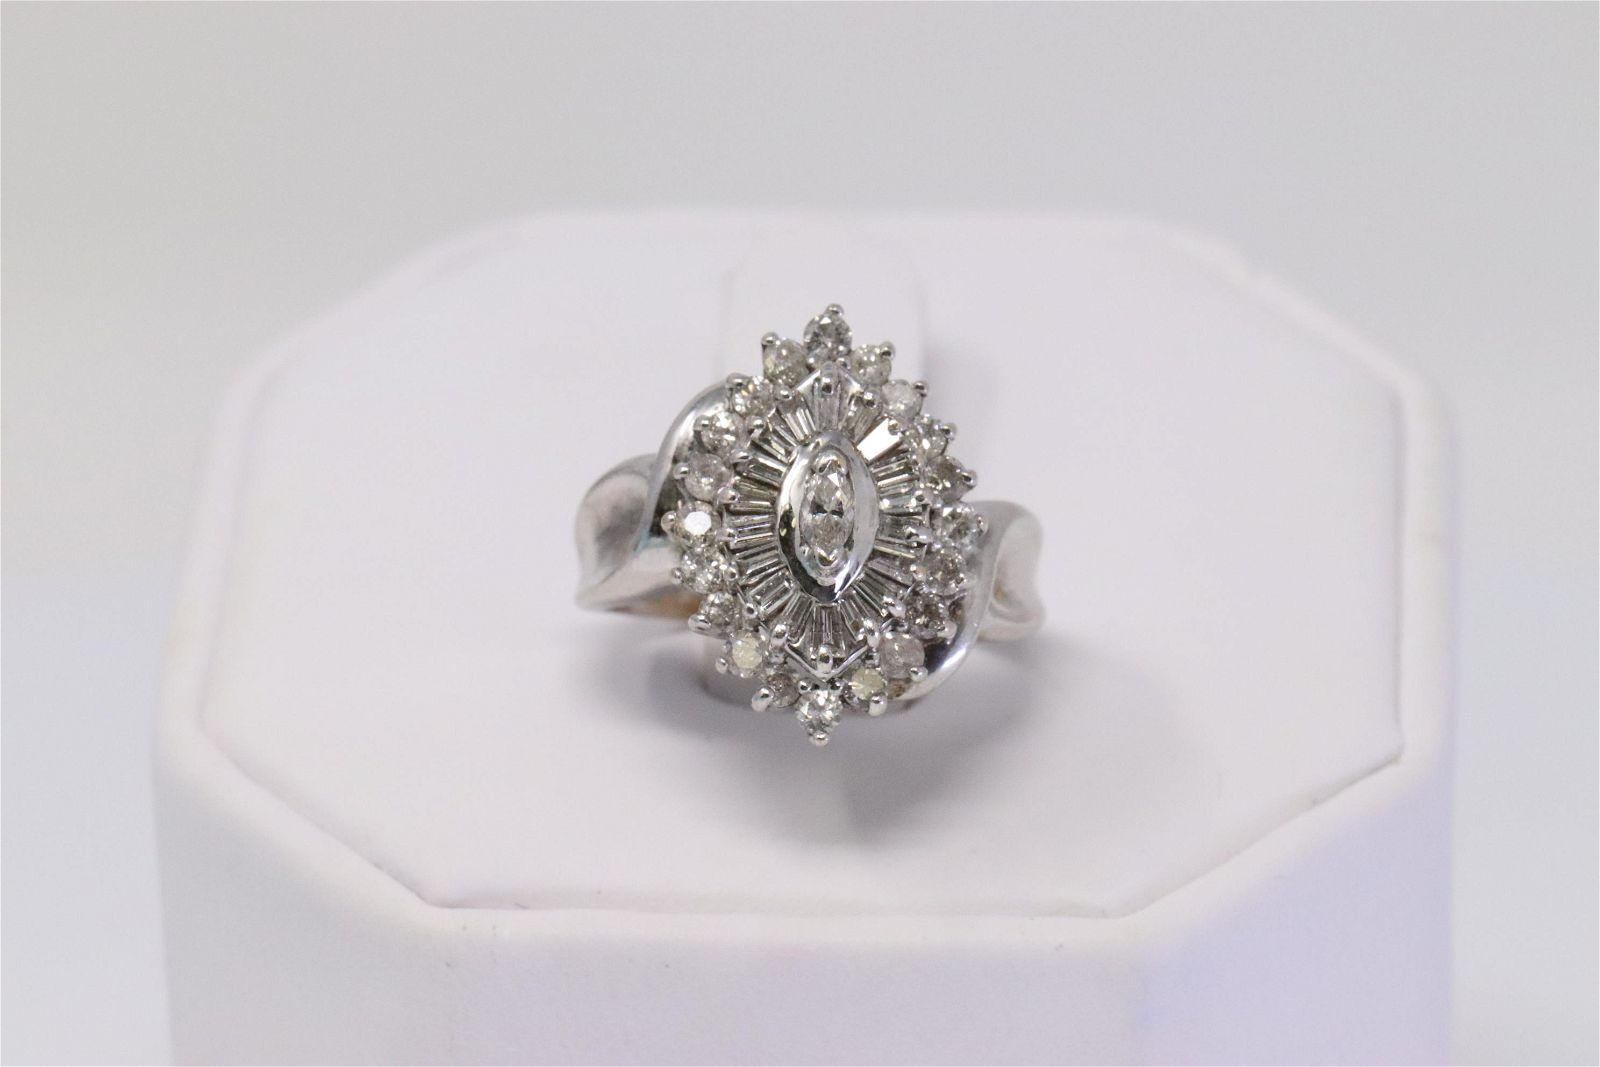 Vintage 14K White Gold Diamond Cocktail Ladies Ring